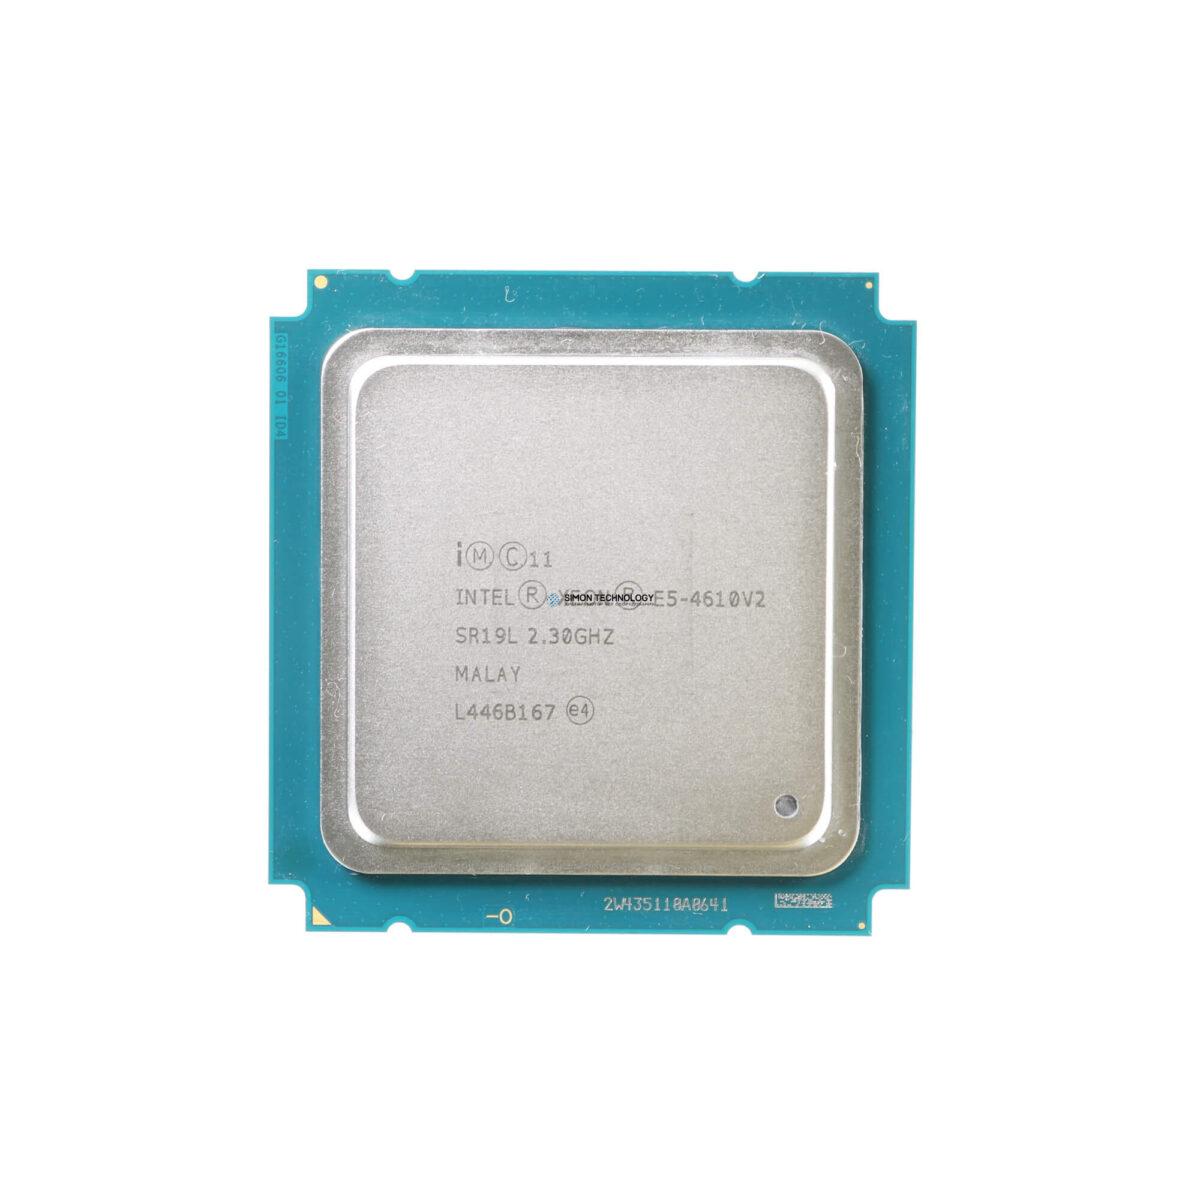 Процессор Intel Xeon E5-4610 v2 8-Core 2.3GHz/16/7.2GTs REF (SR19L)